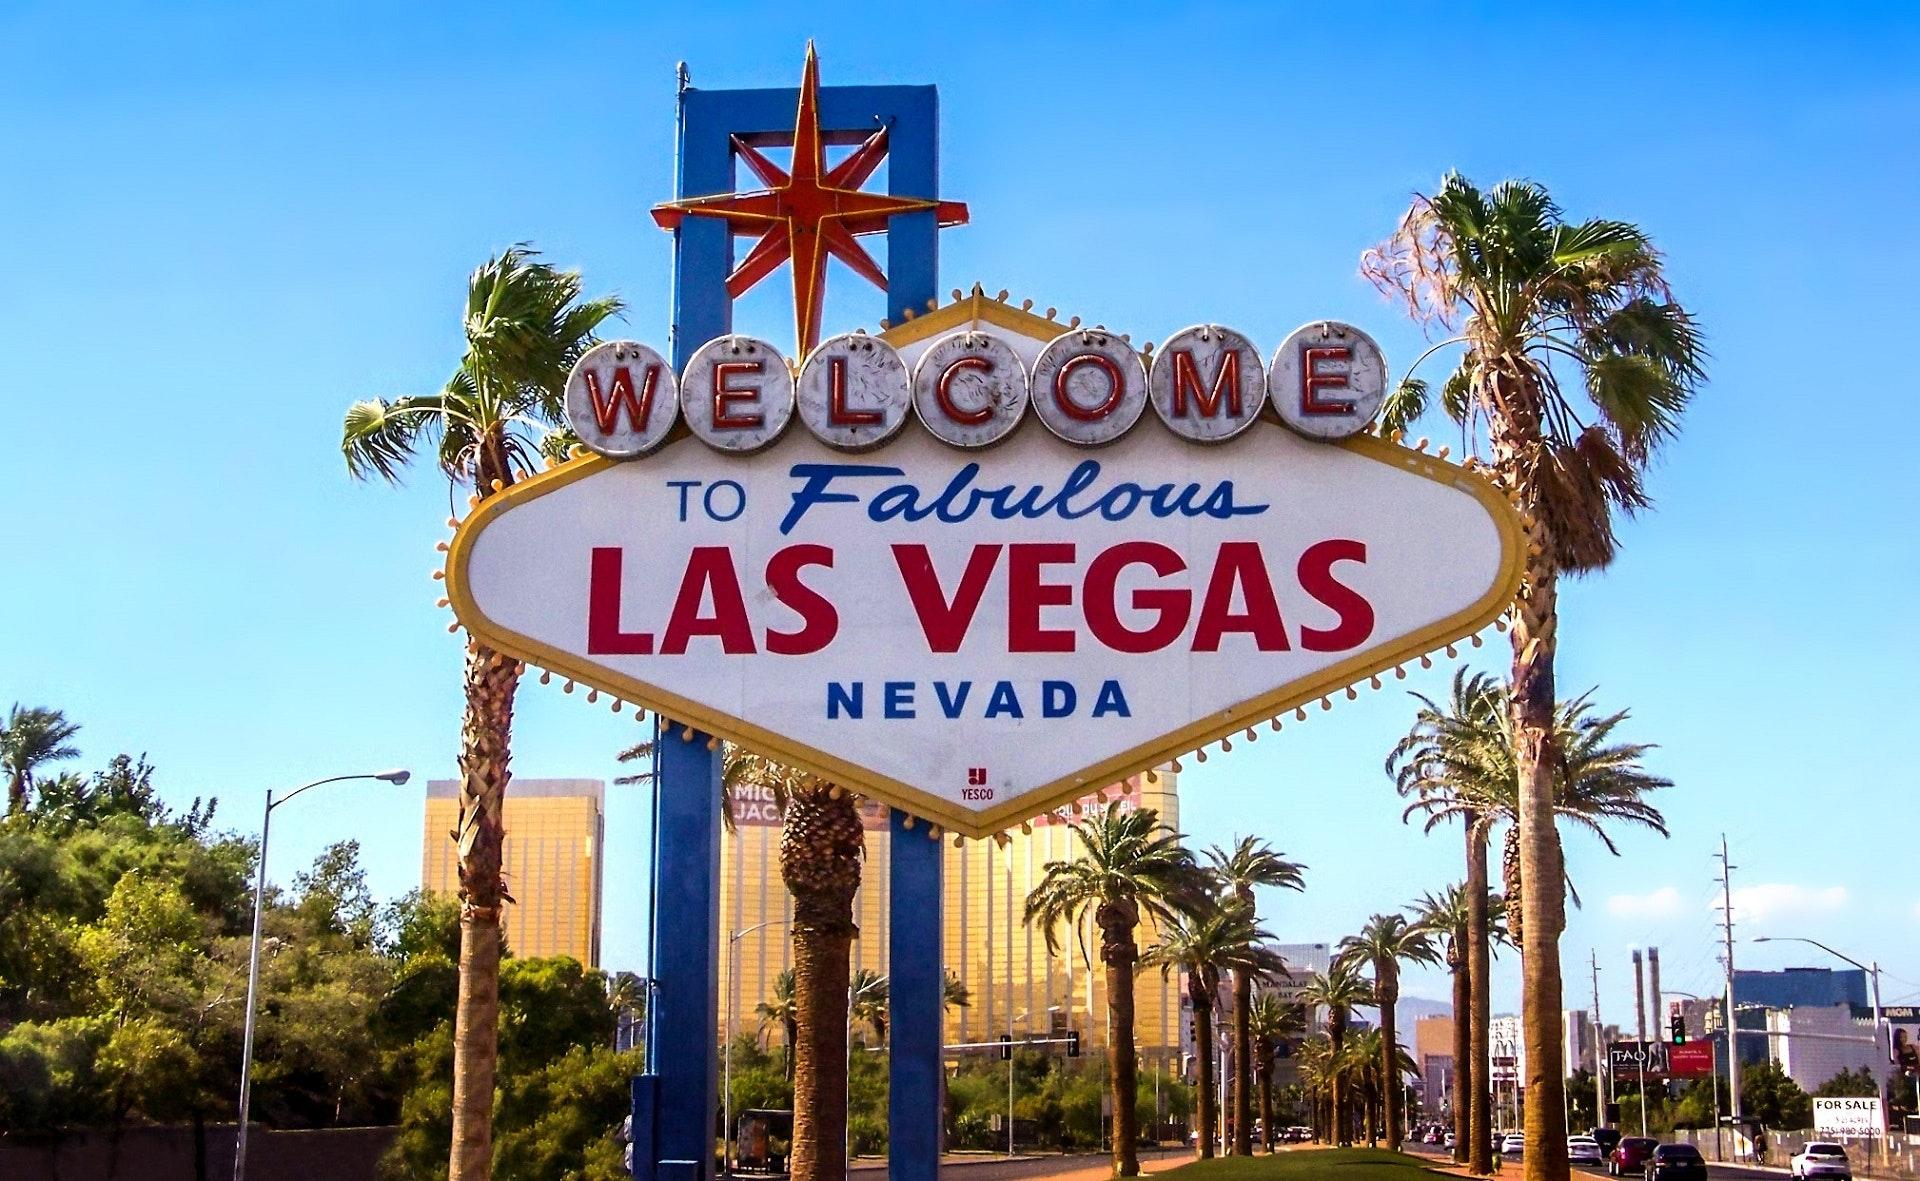 Best Businesses to Start in Las Vegas in 2020